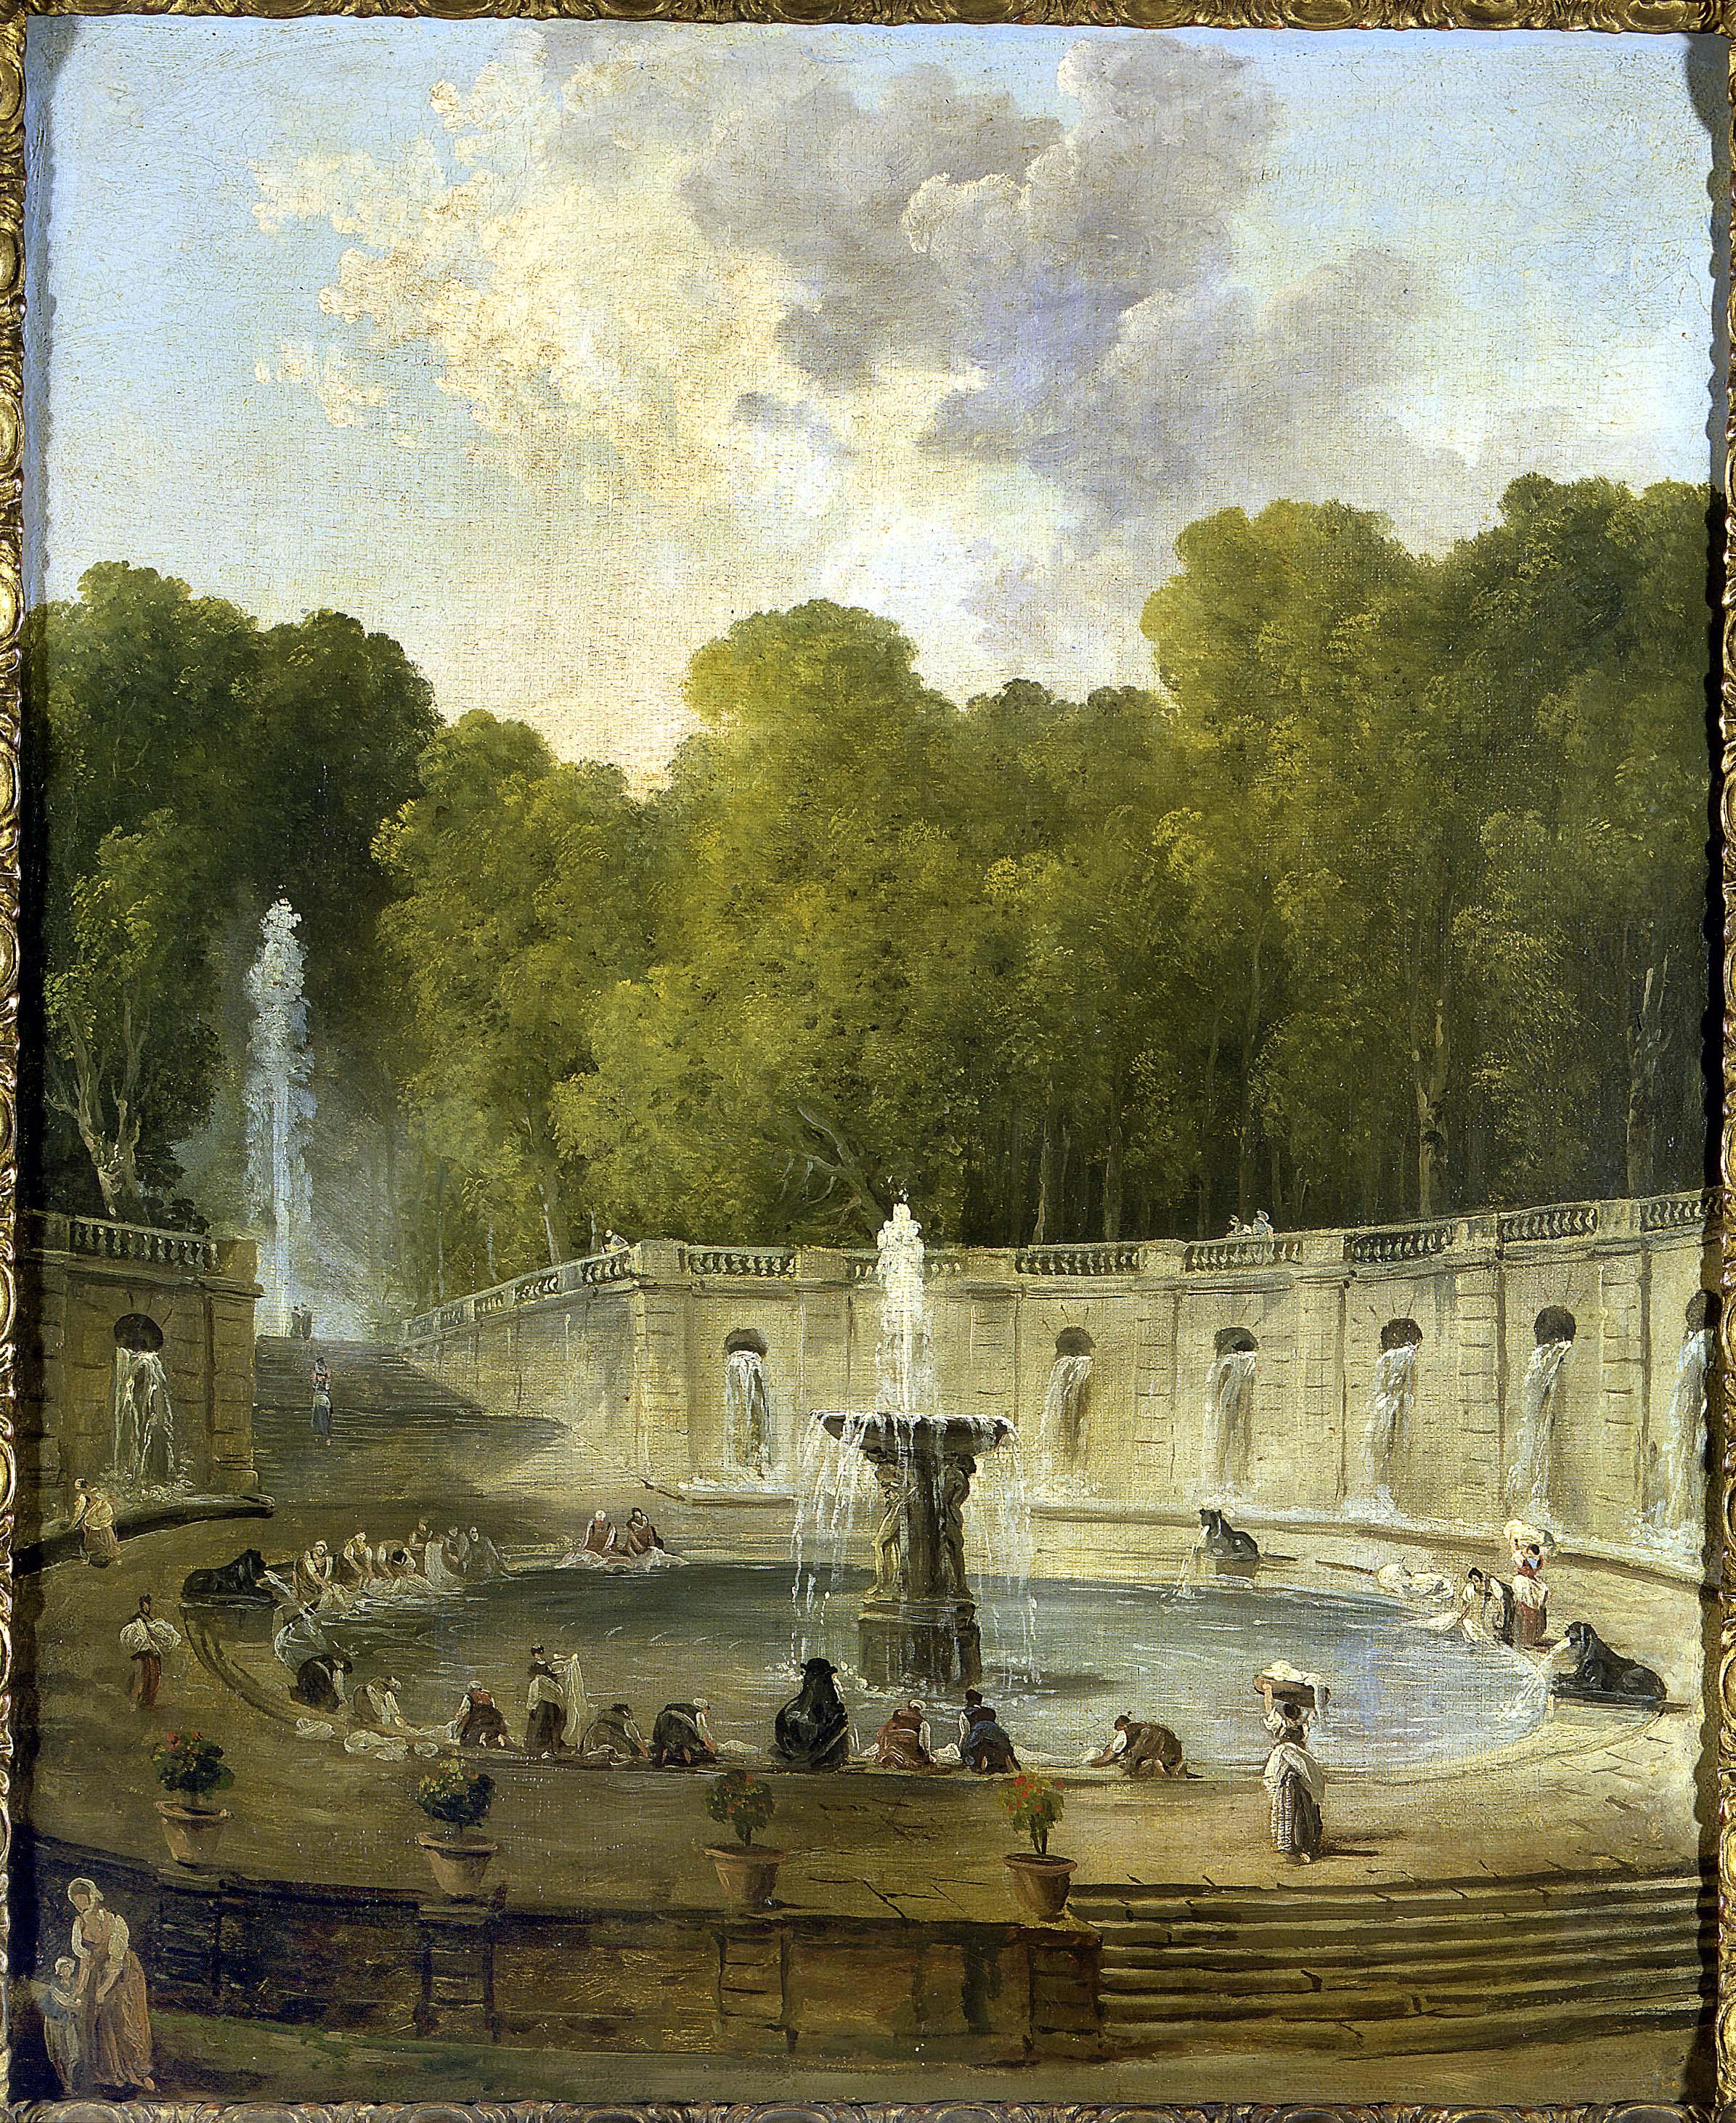 Hubert Robert - Washerwomen in a garden